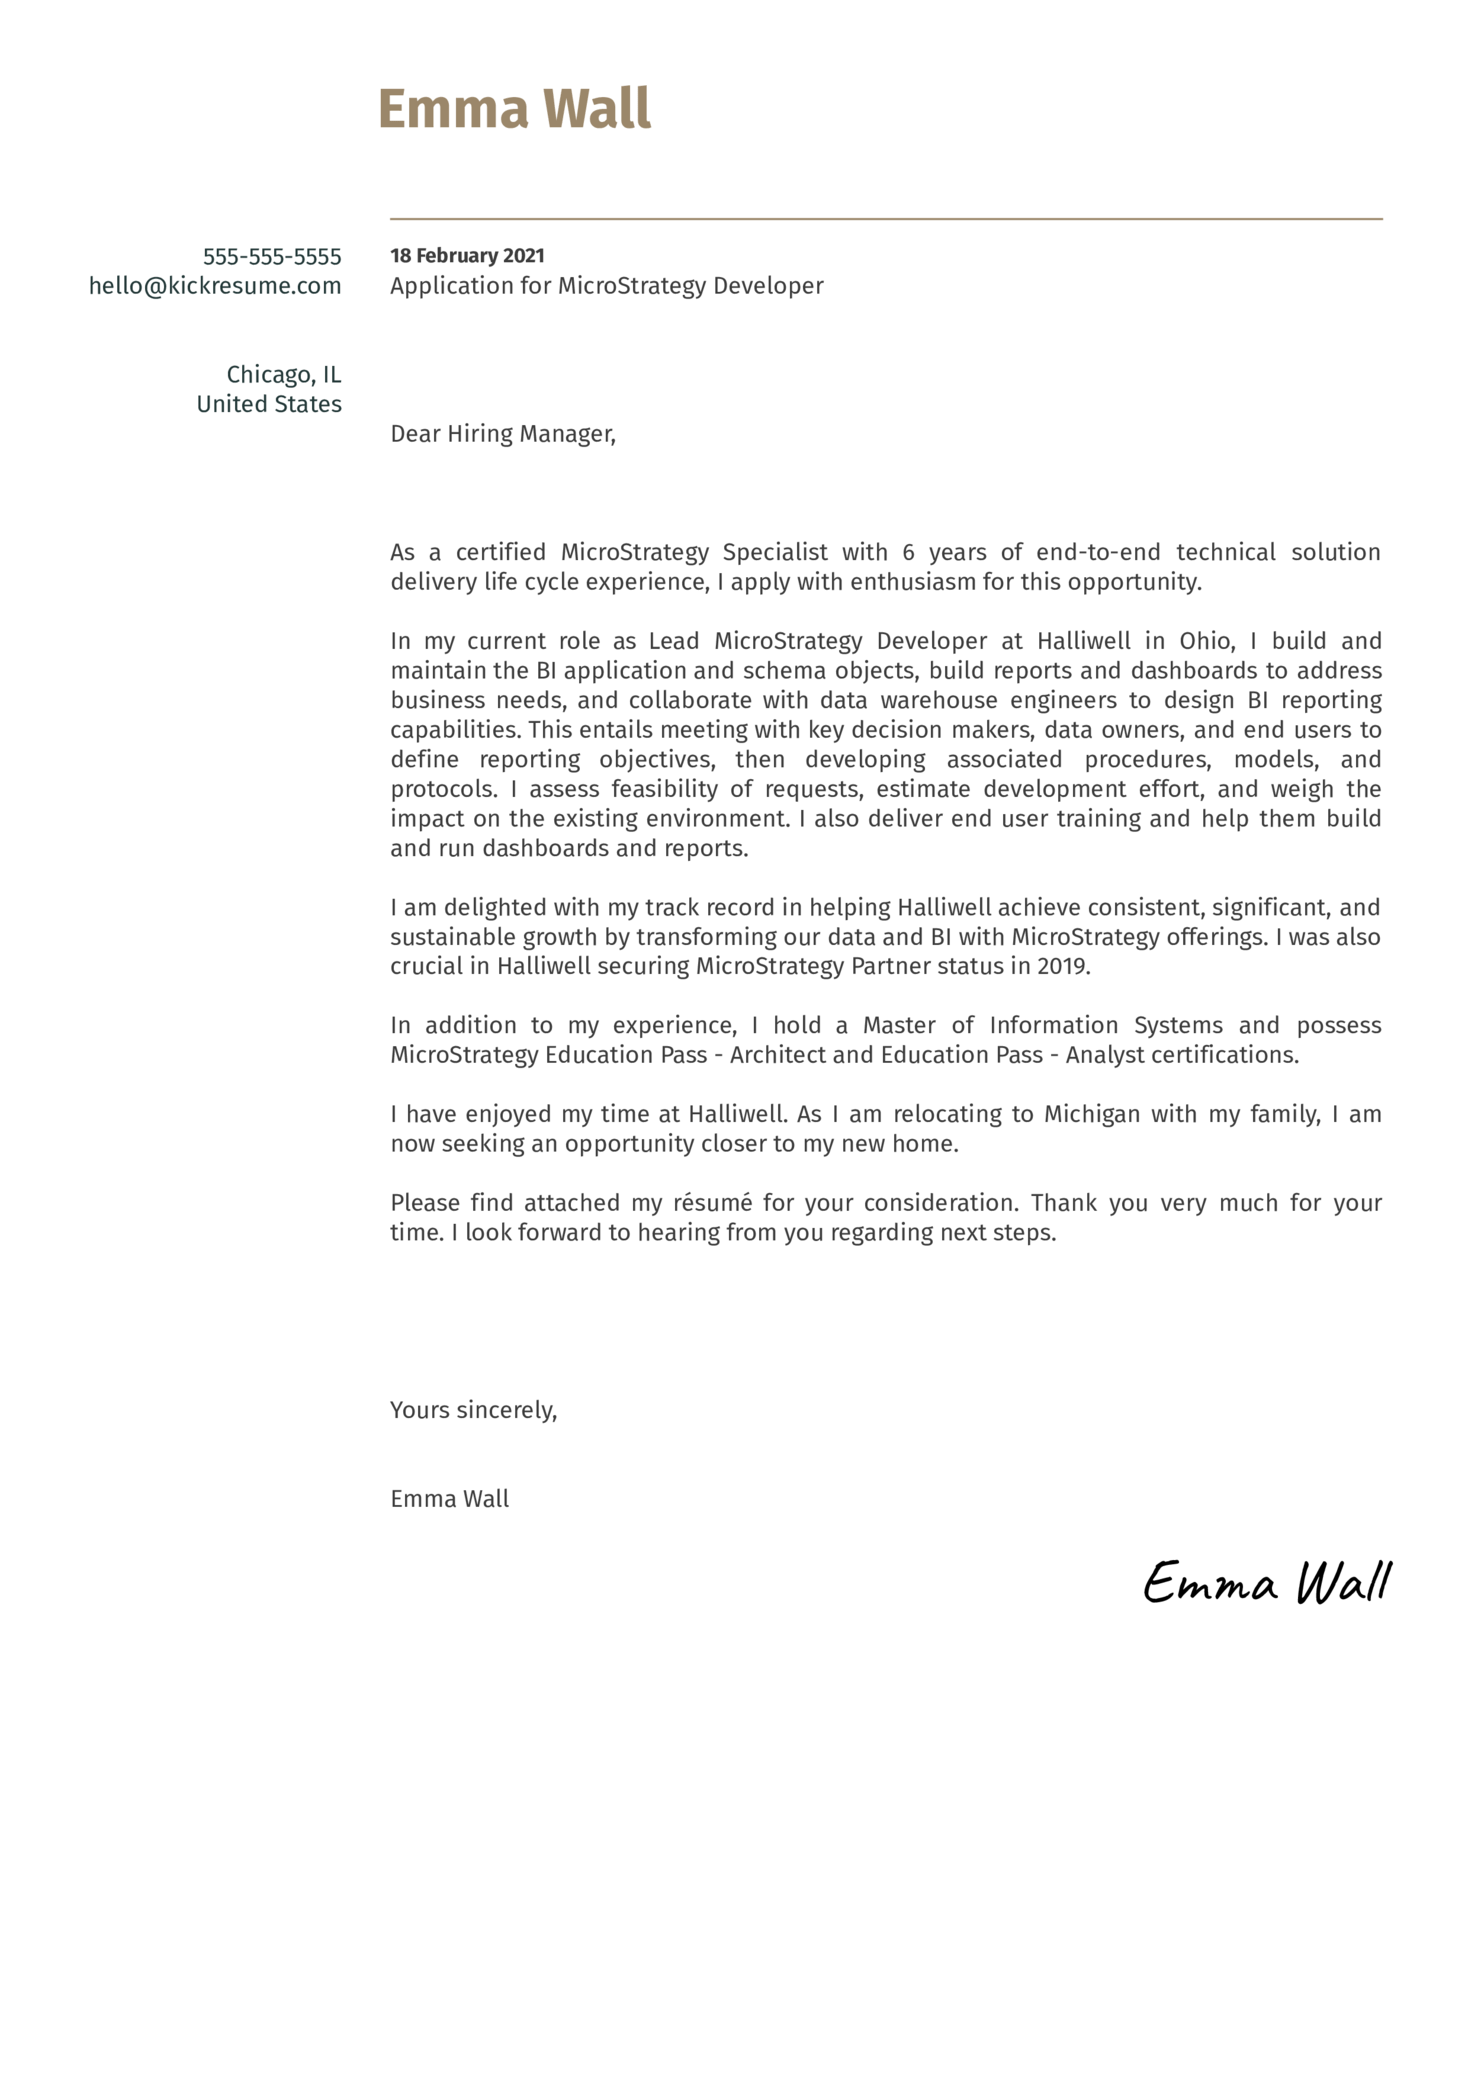 MicroStrategy Developer Cover Letter Sample